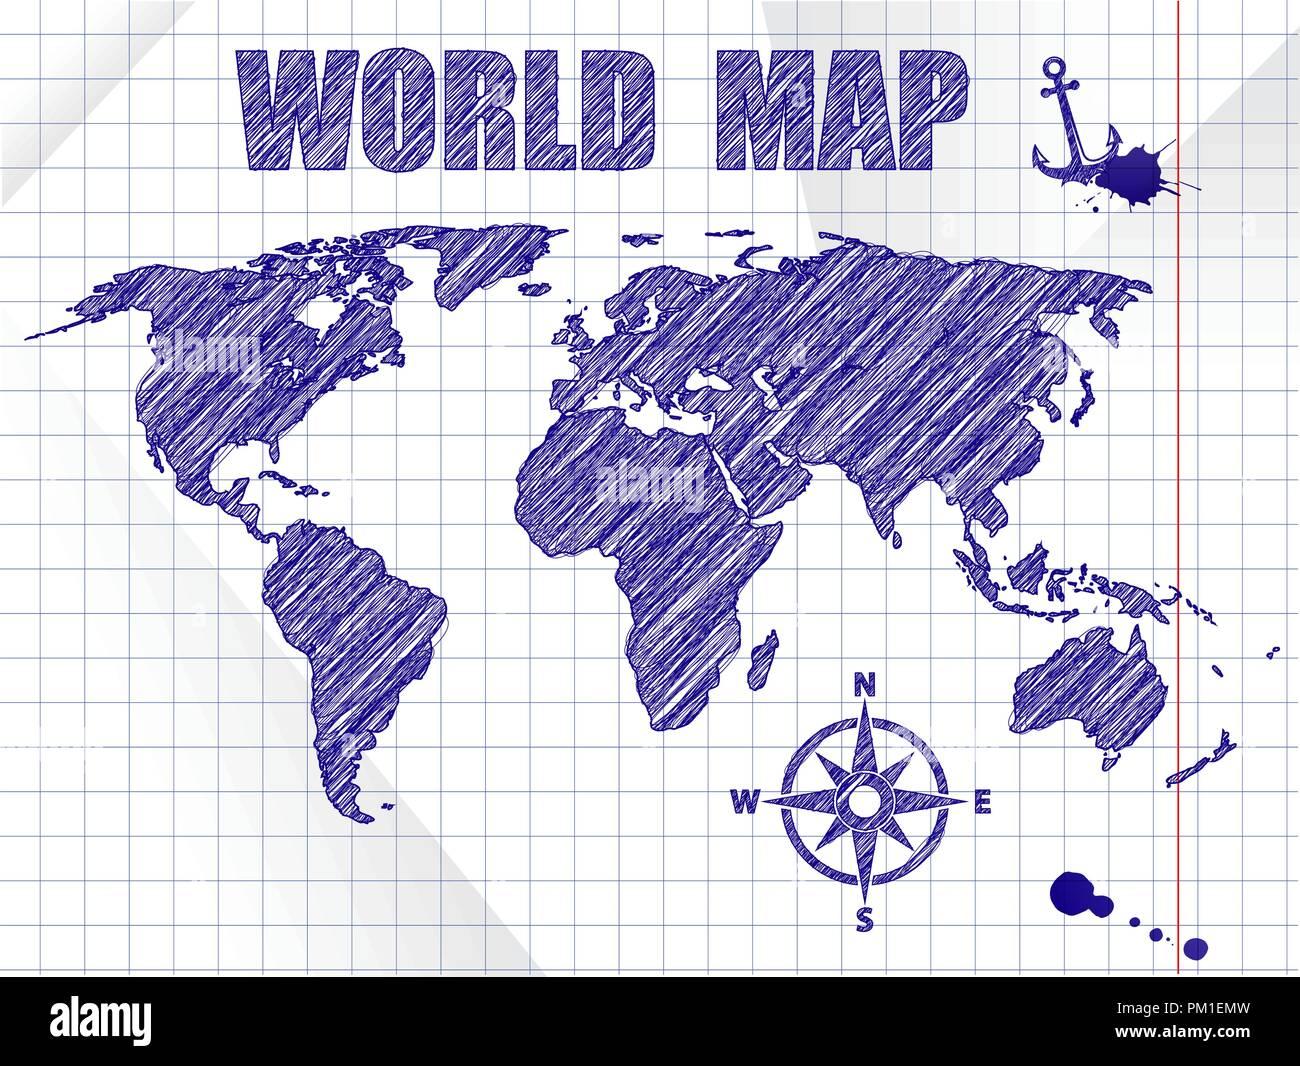 Blue ink sketched navigation world map on school notebook sheet background. - Stock Image